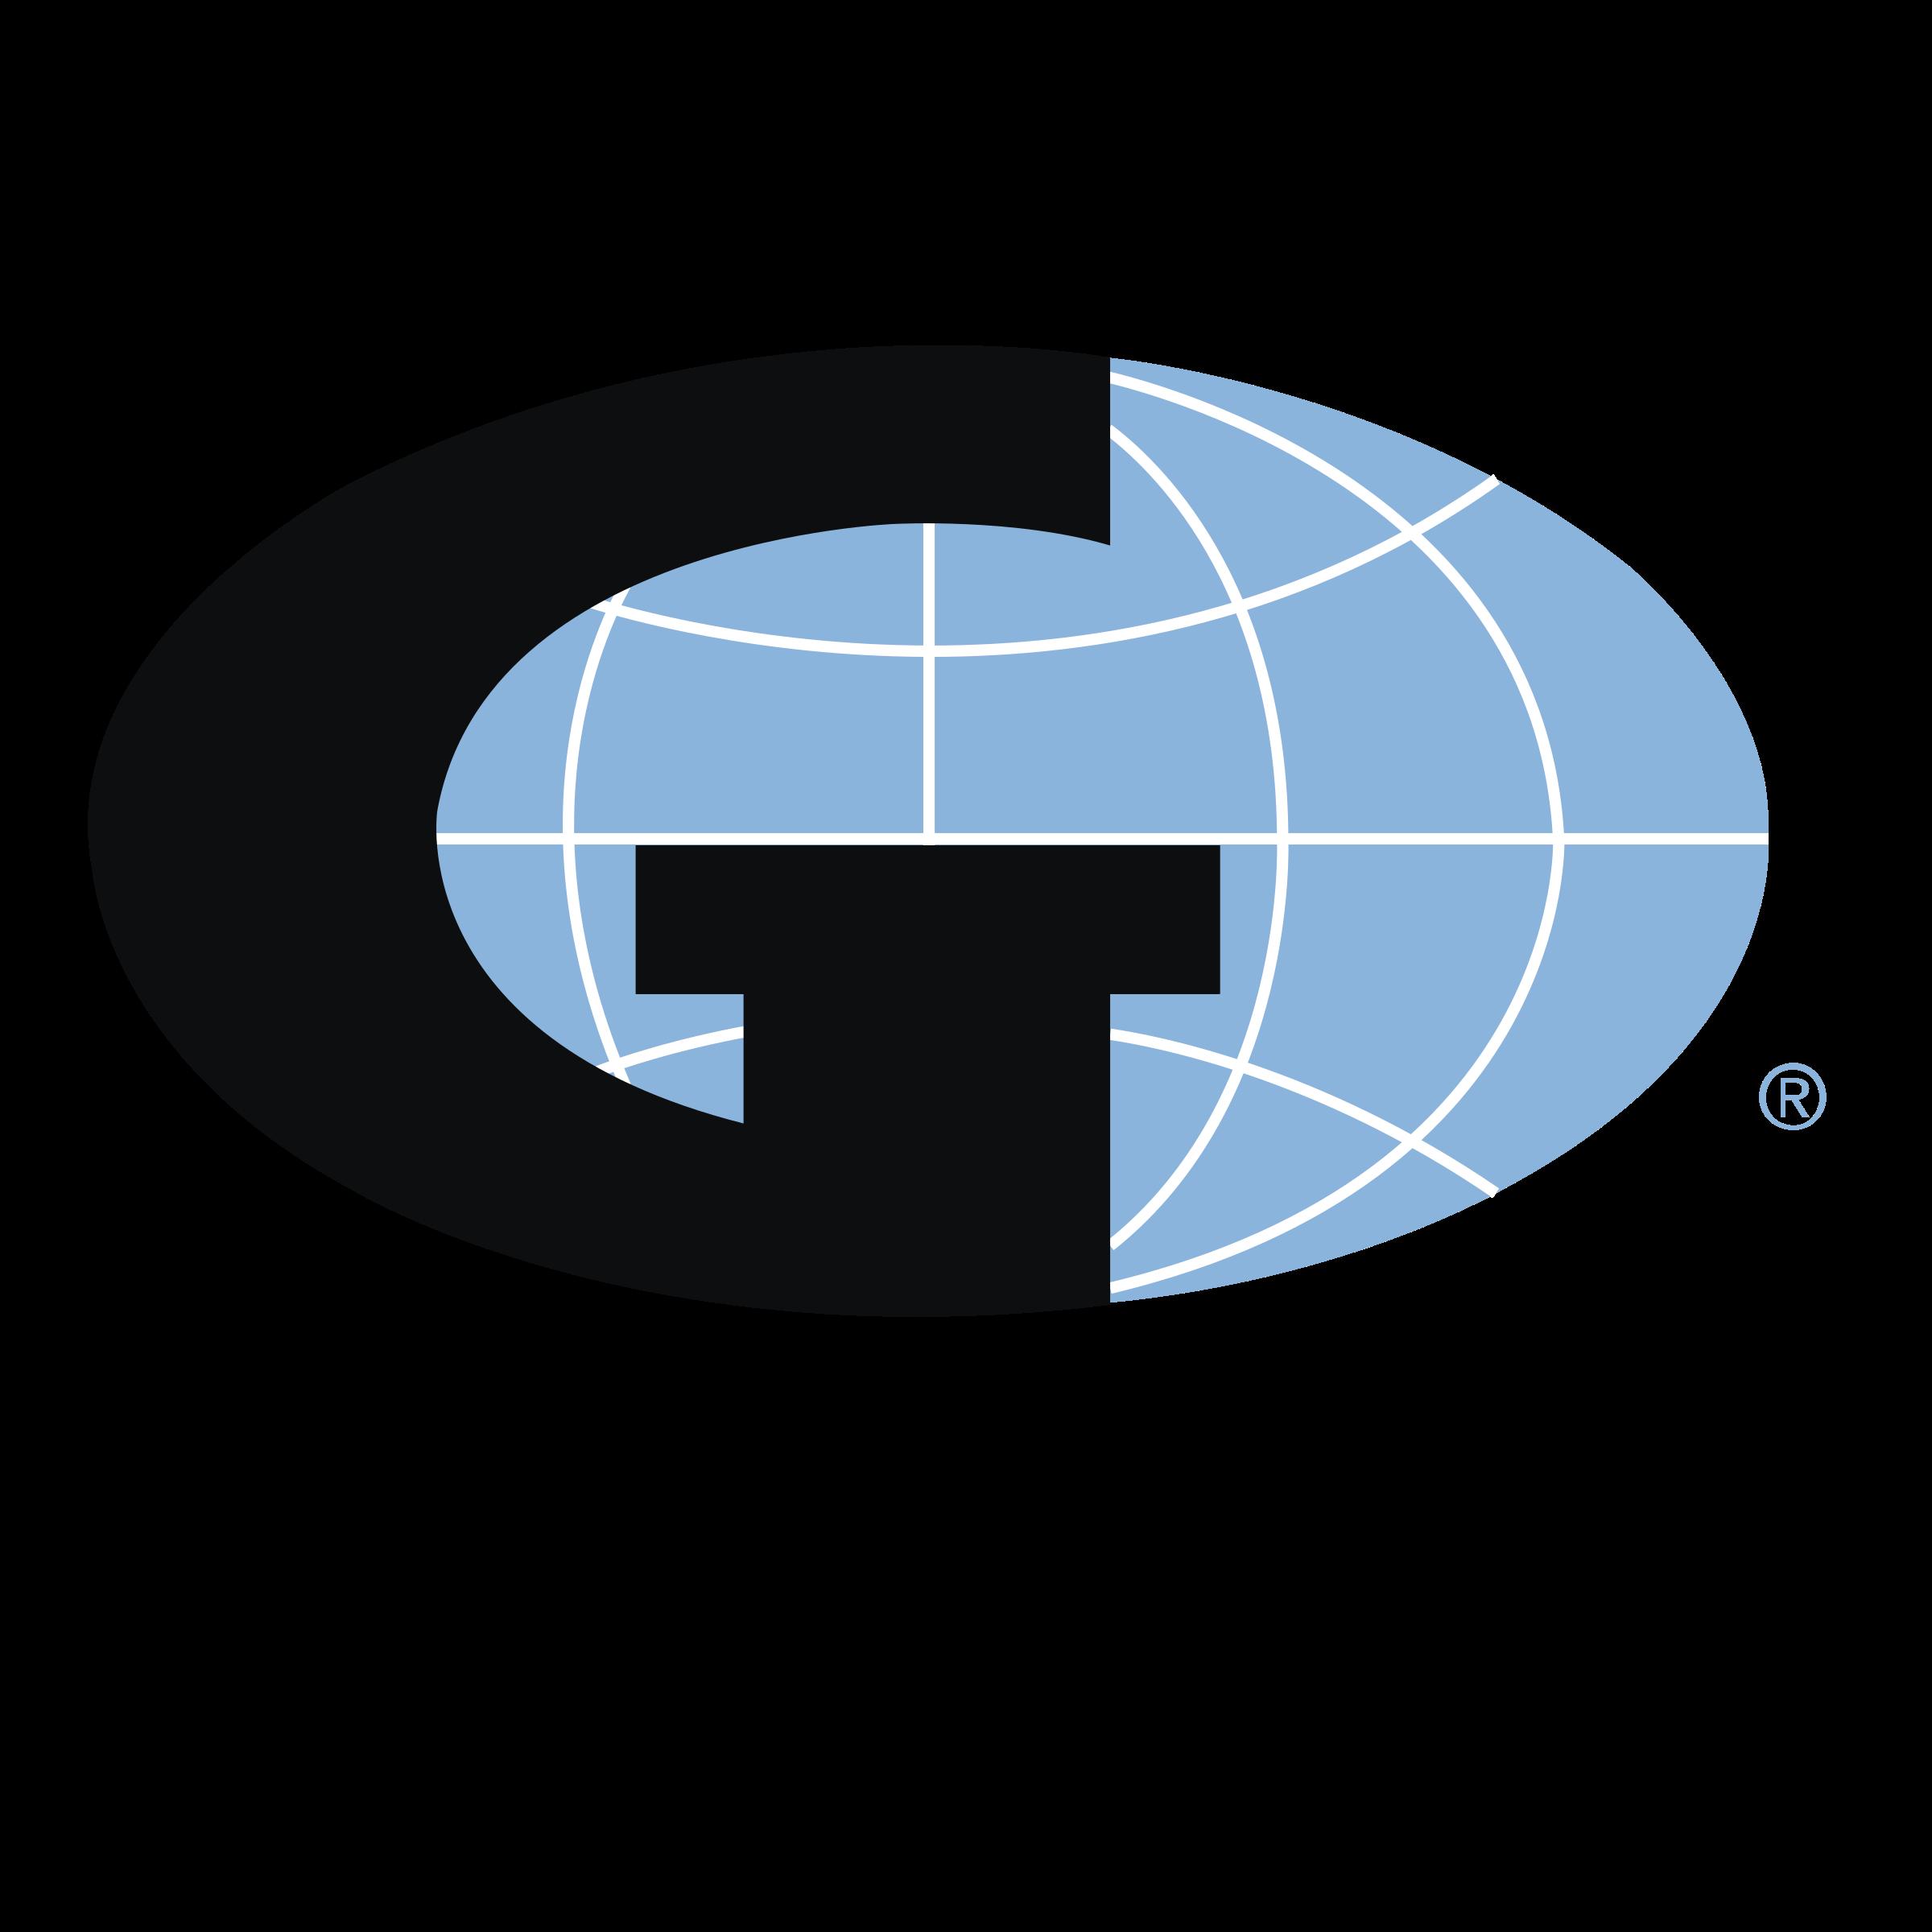 gallagher-1-logo-png-transparent.png